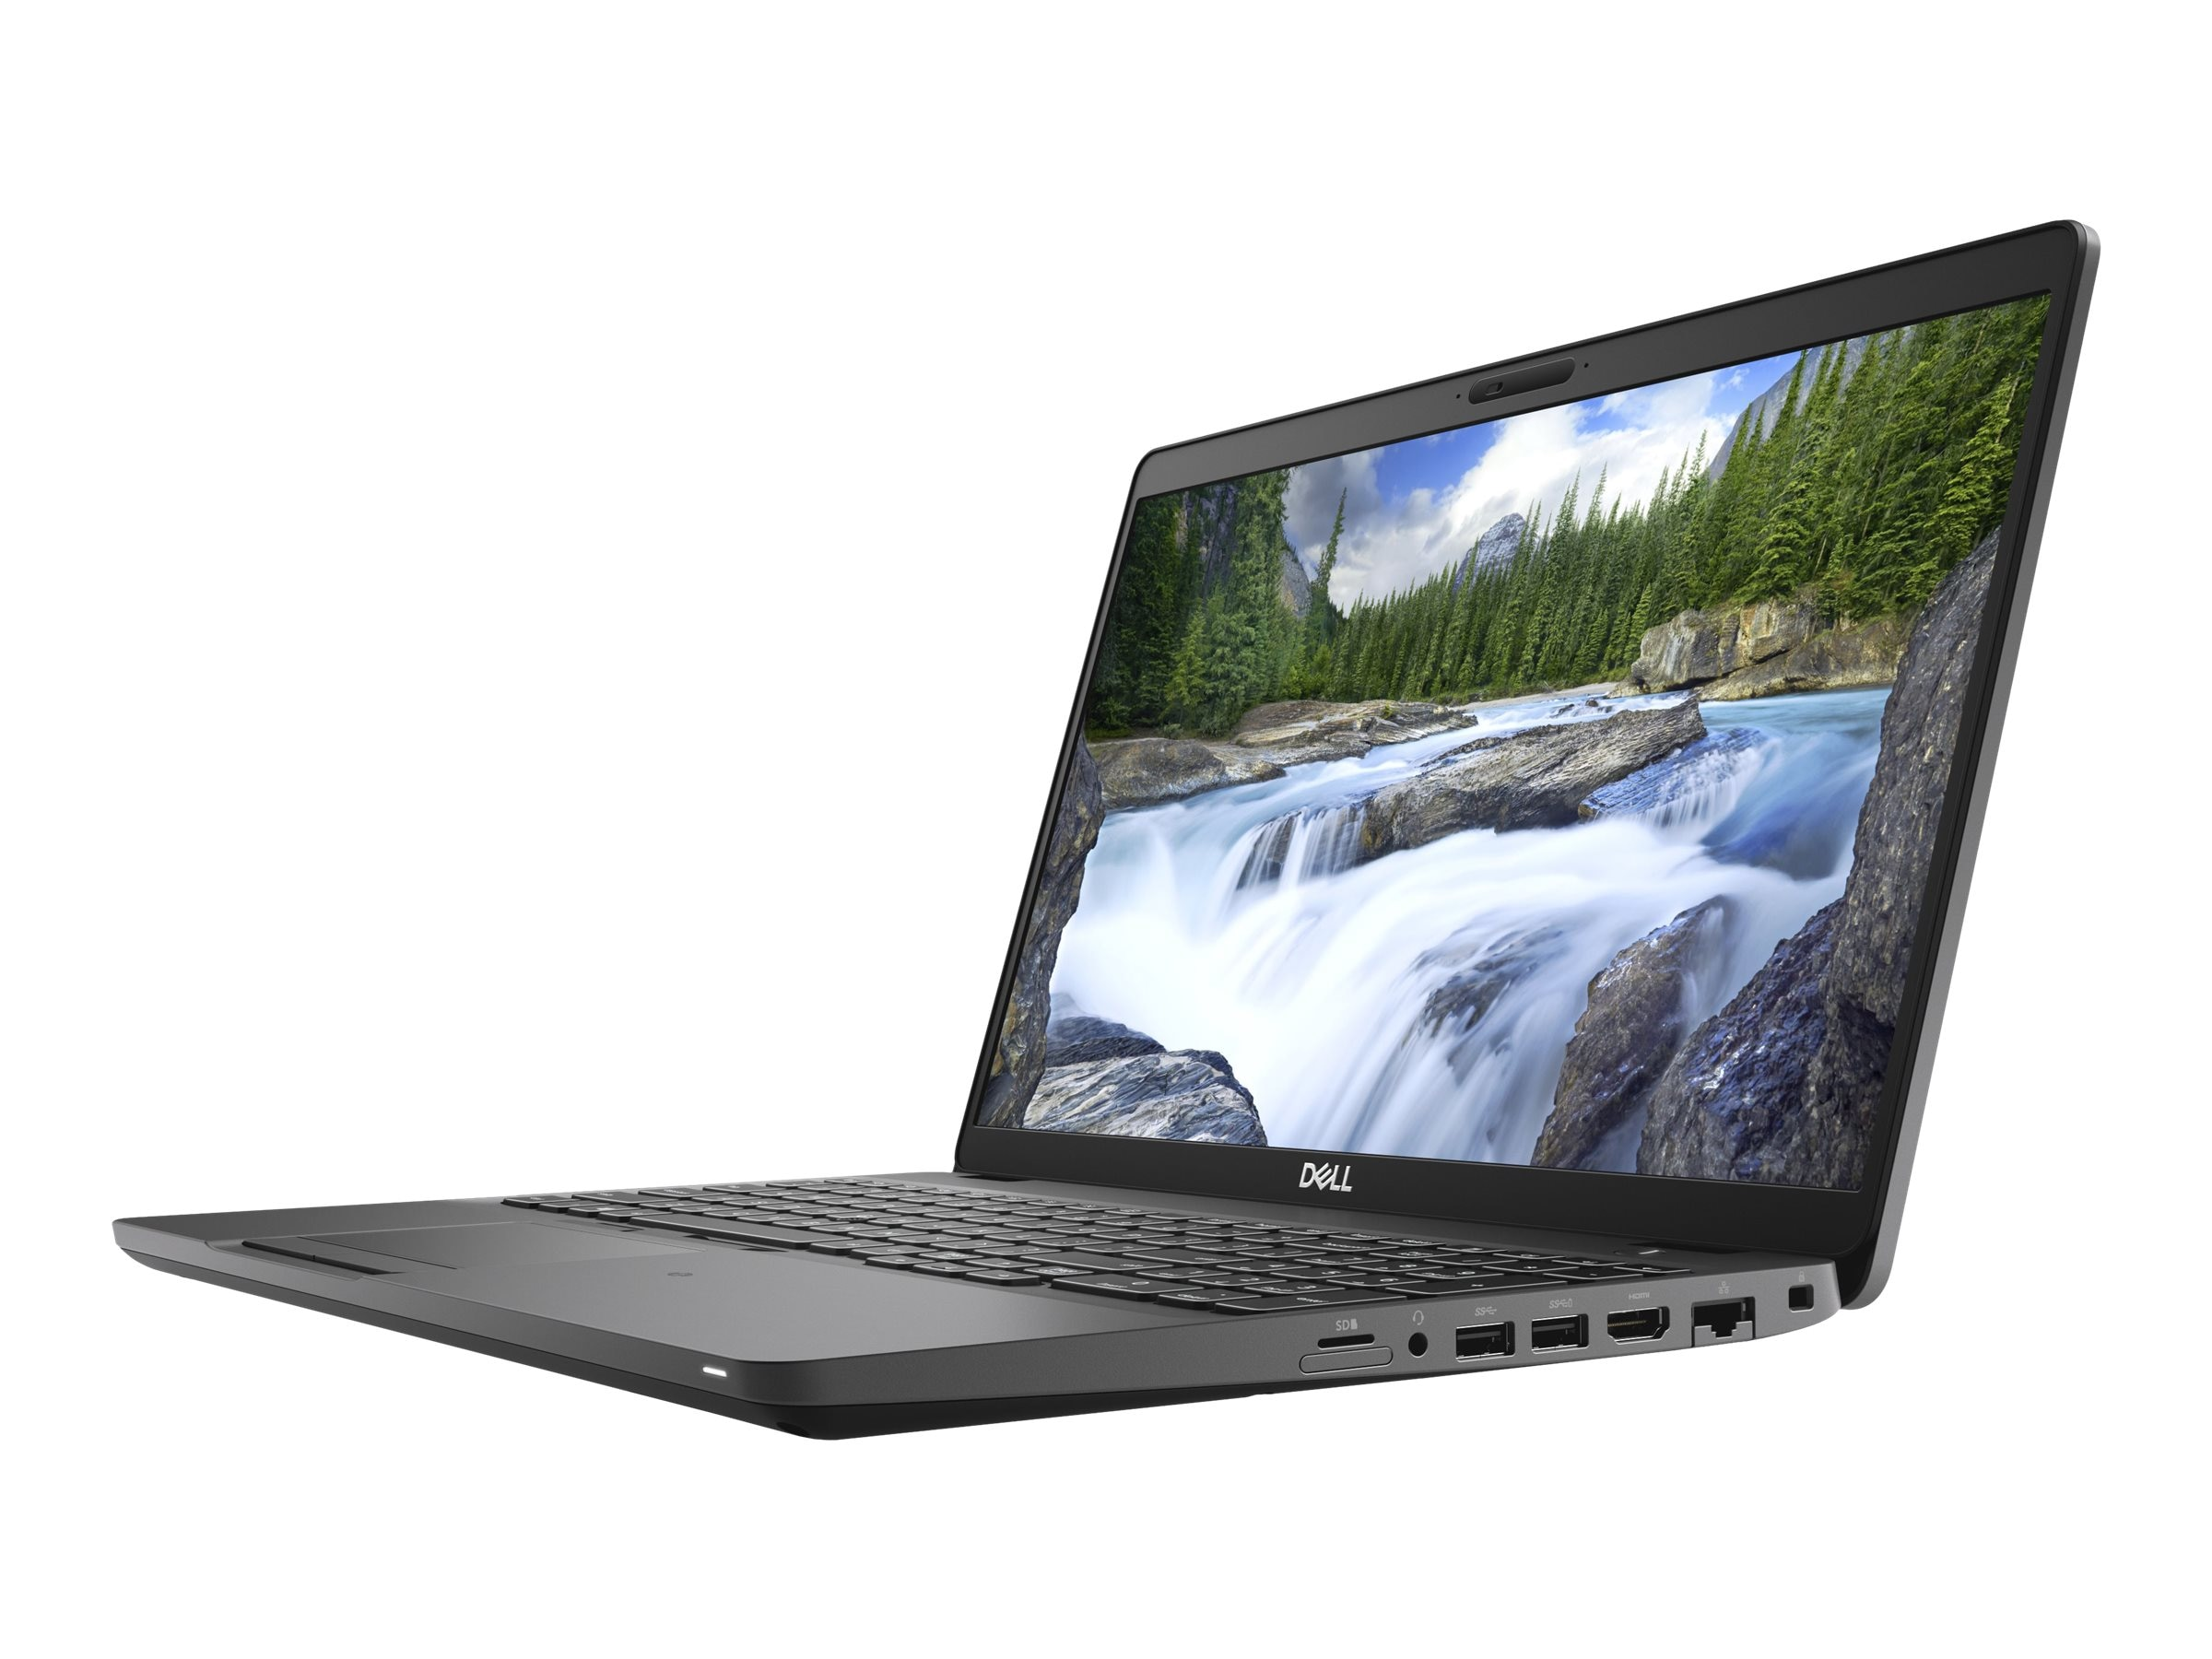 Dell Latitude 5500 Core i5-8265U 1 6GHz 8GB 256GB PCIe ac BT WC 15 6